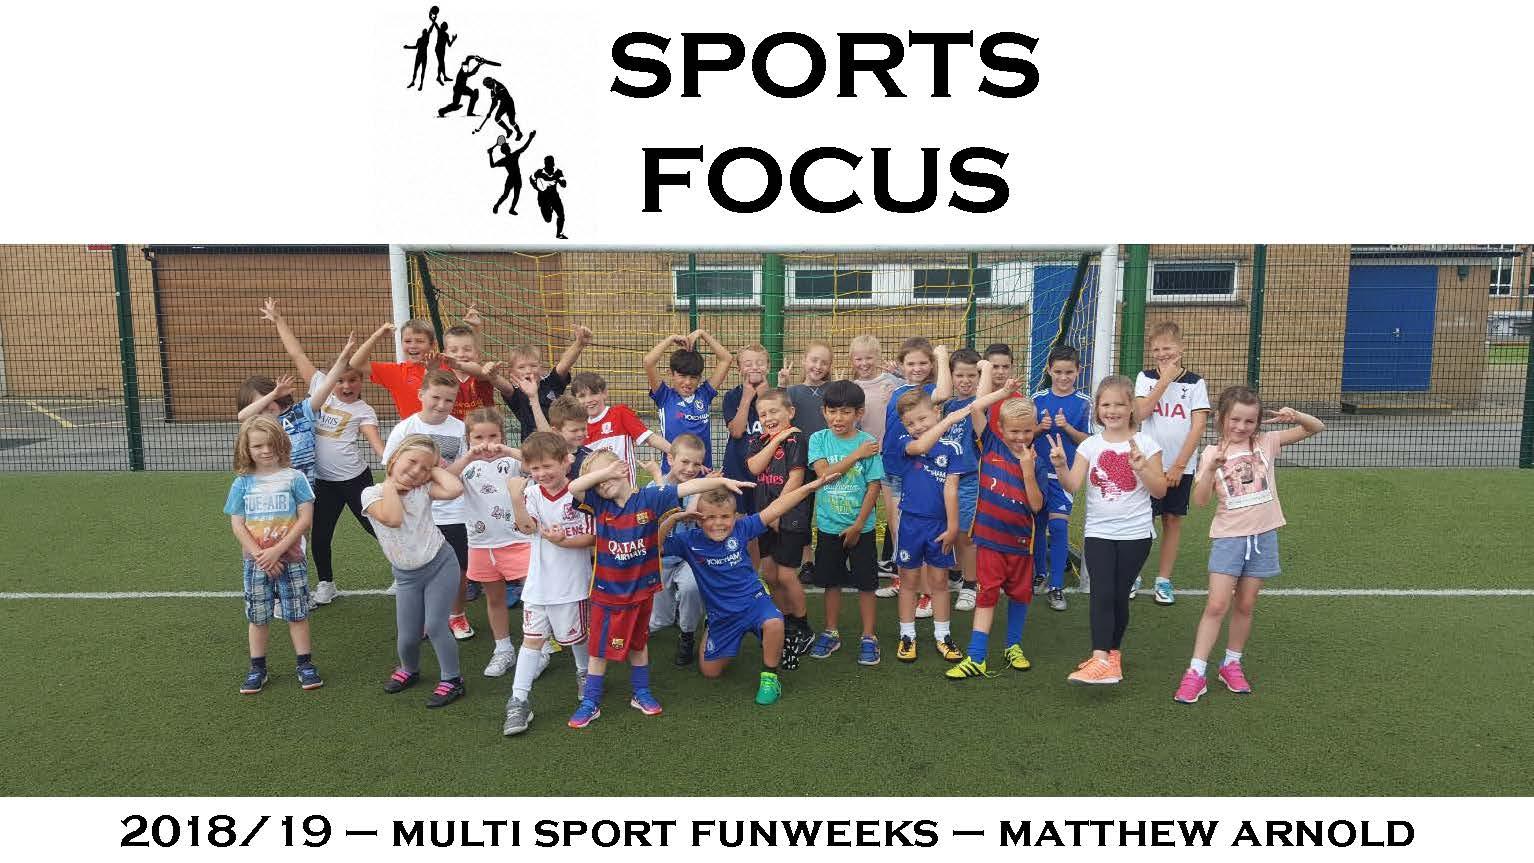 Matthew Arnold – 2019 multi sport funweeks